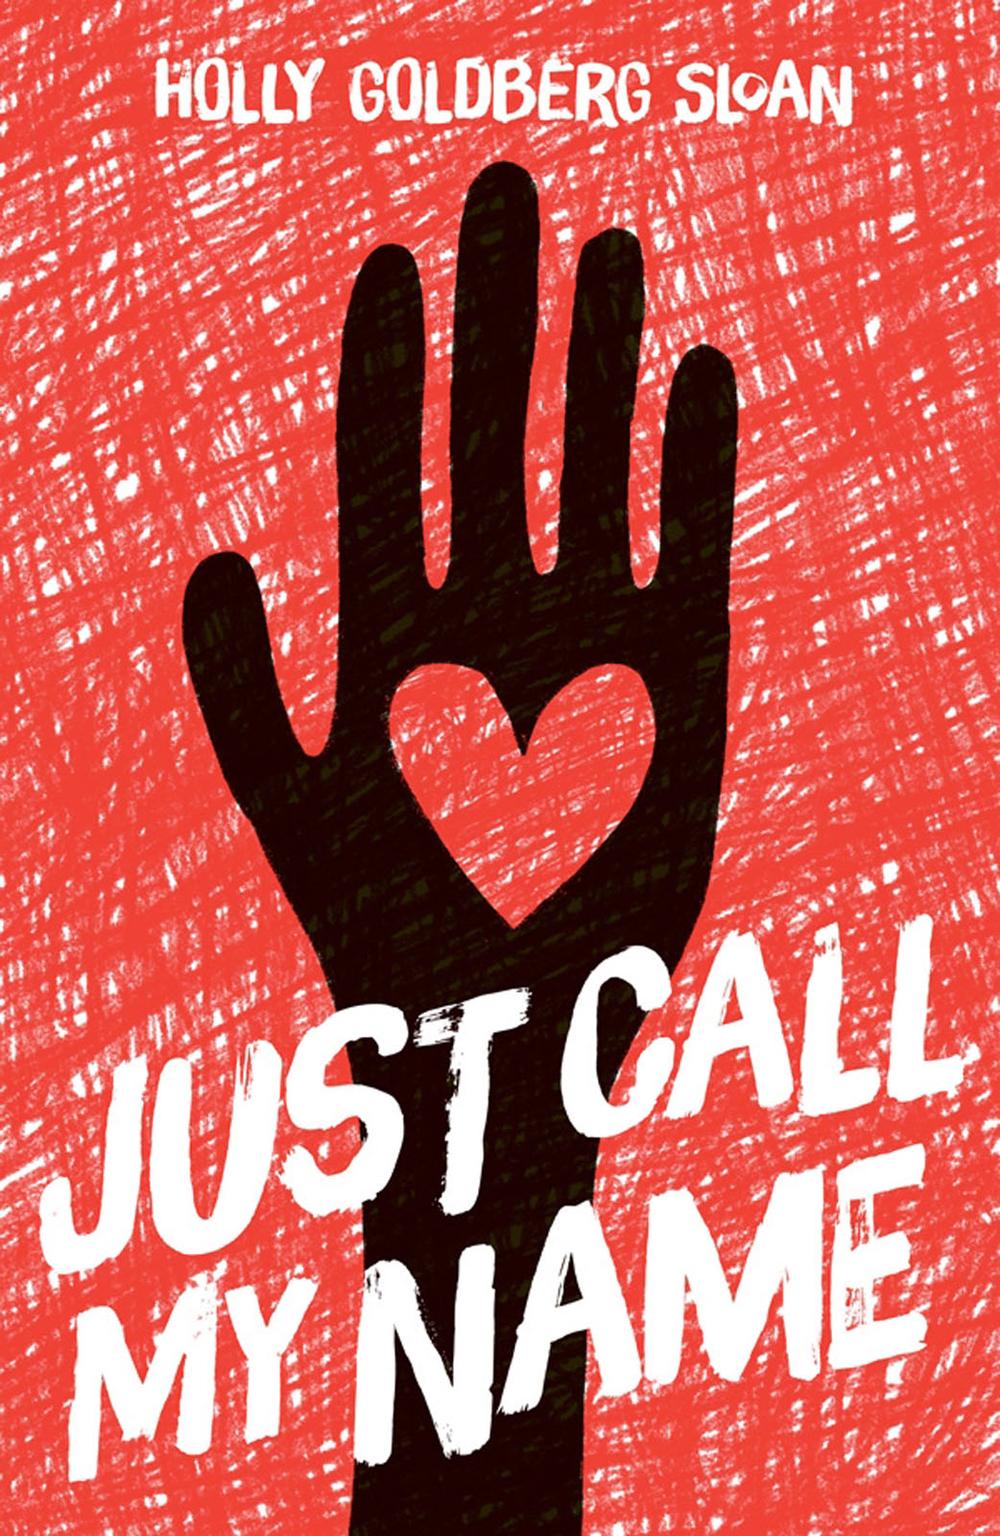 sloan-call-name.png